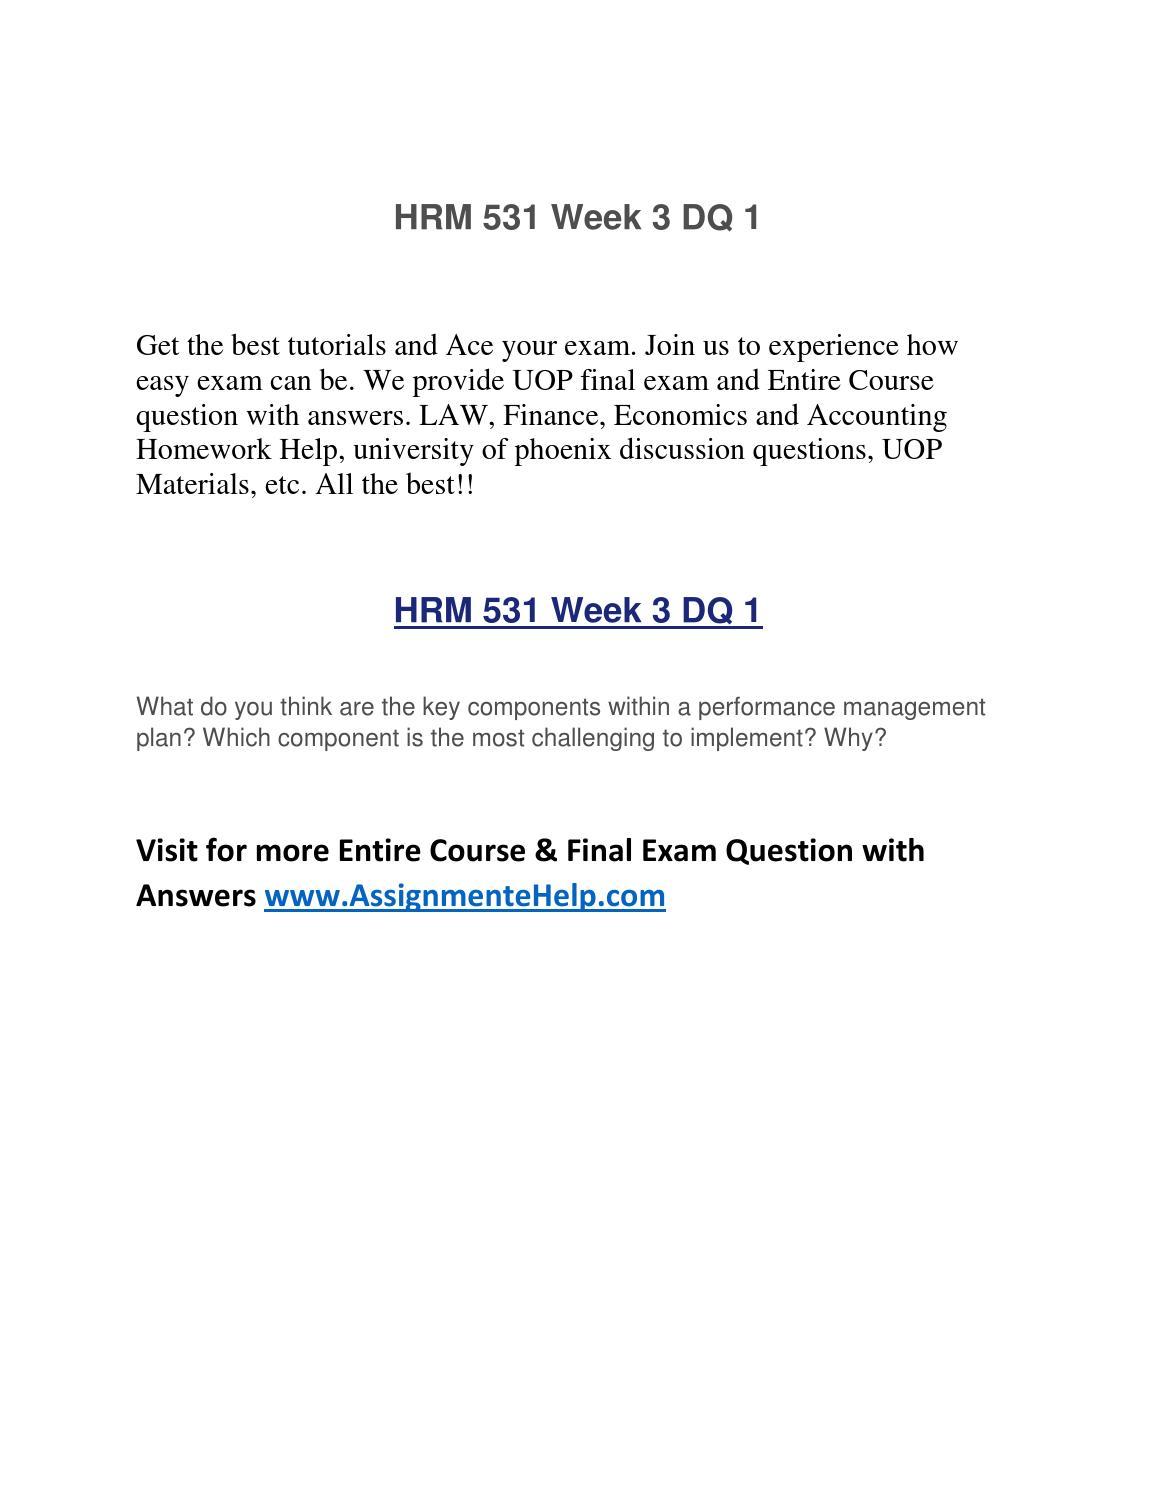 hrm 531 performance management plan Learning team reflection human capital management hrm 531 1550 hrm 531 week 4 assignment performance management plan complete the task described.